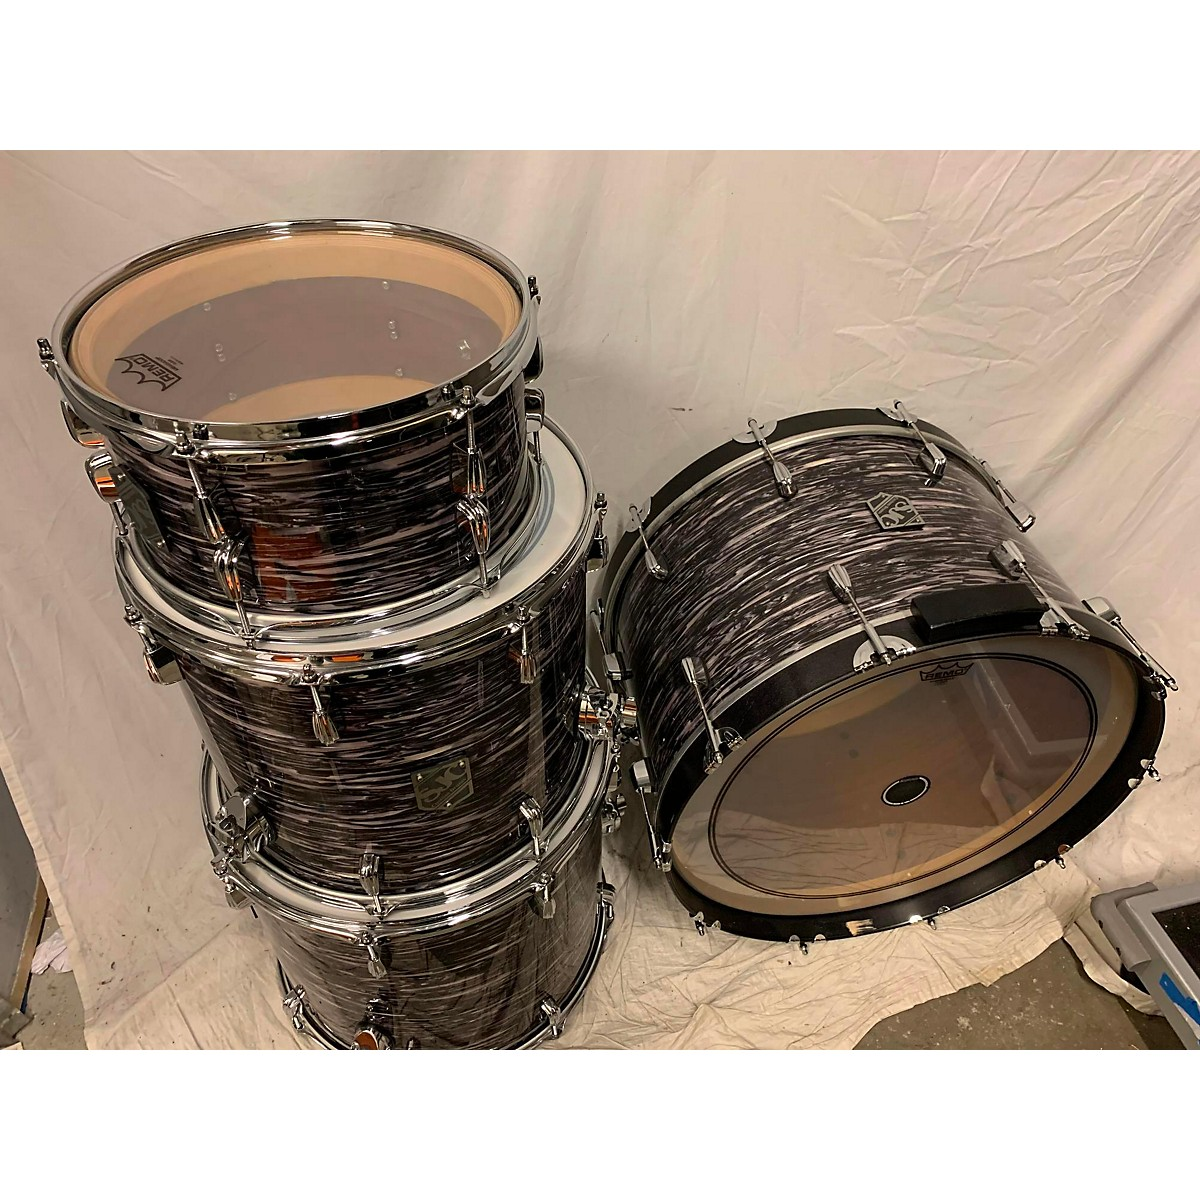 SJC CUSTOM 4 PIECE Drum Kit